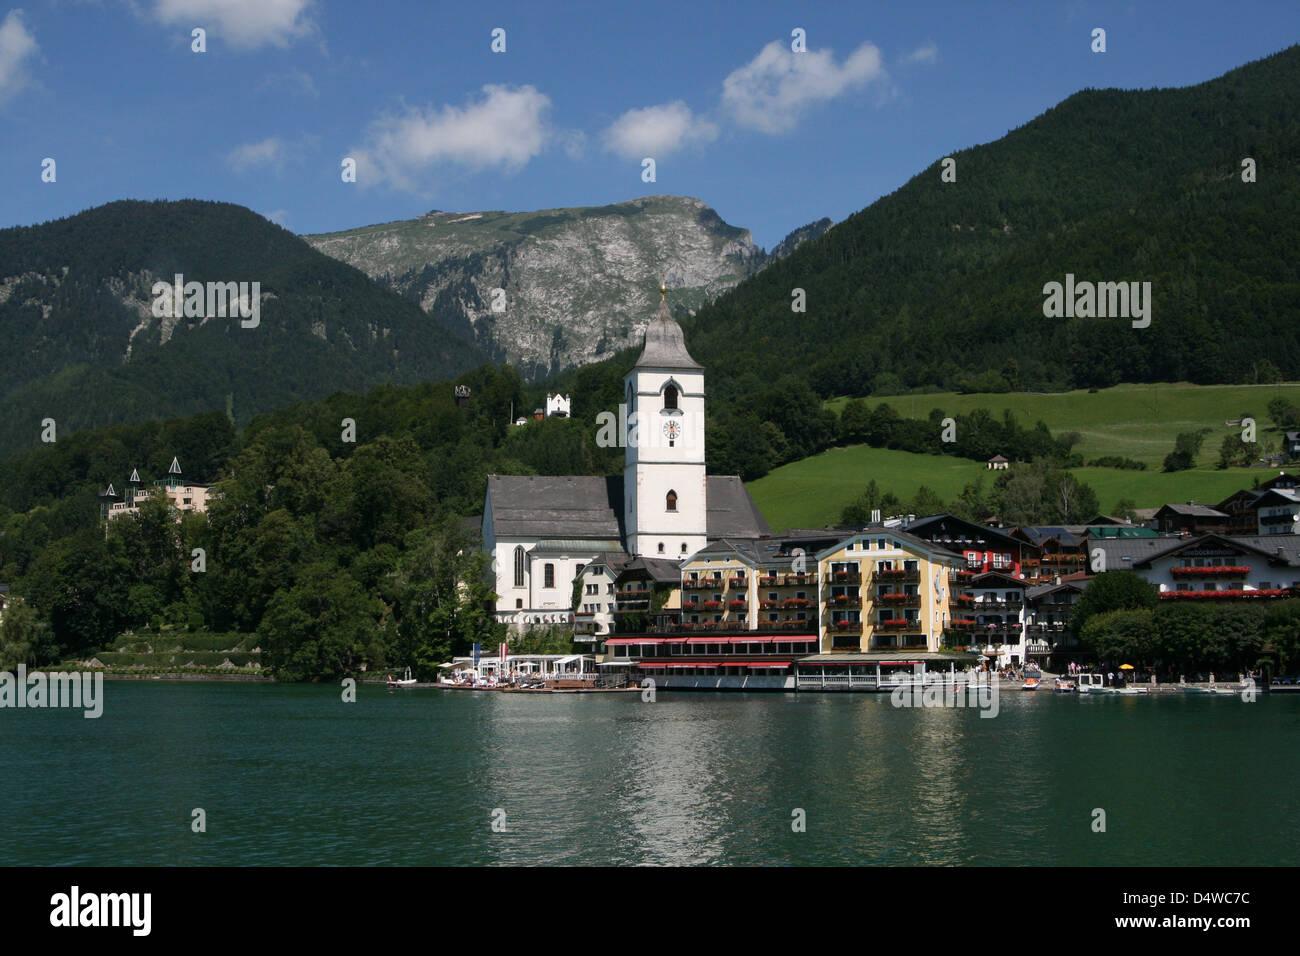 St wolfgang im salzkammergut austria stock photo 54648144 alamy st wolfgang im salzkammergut austria sciox Images